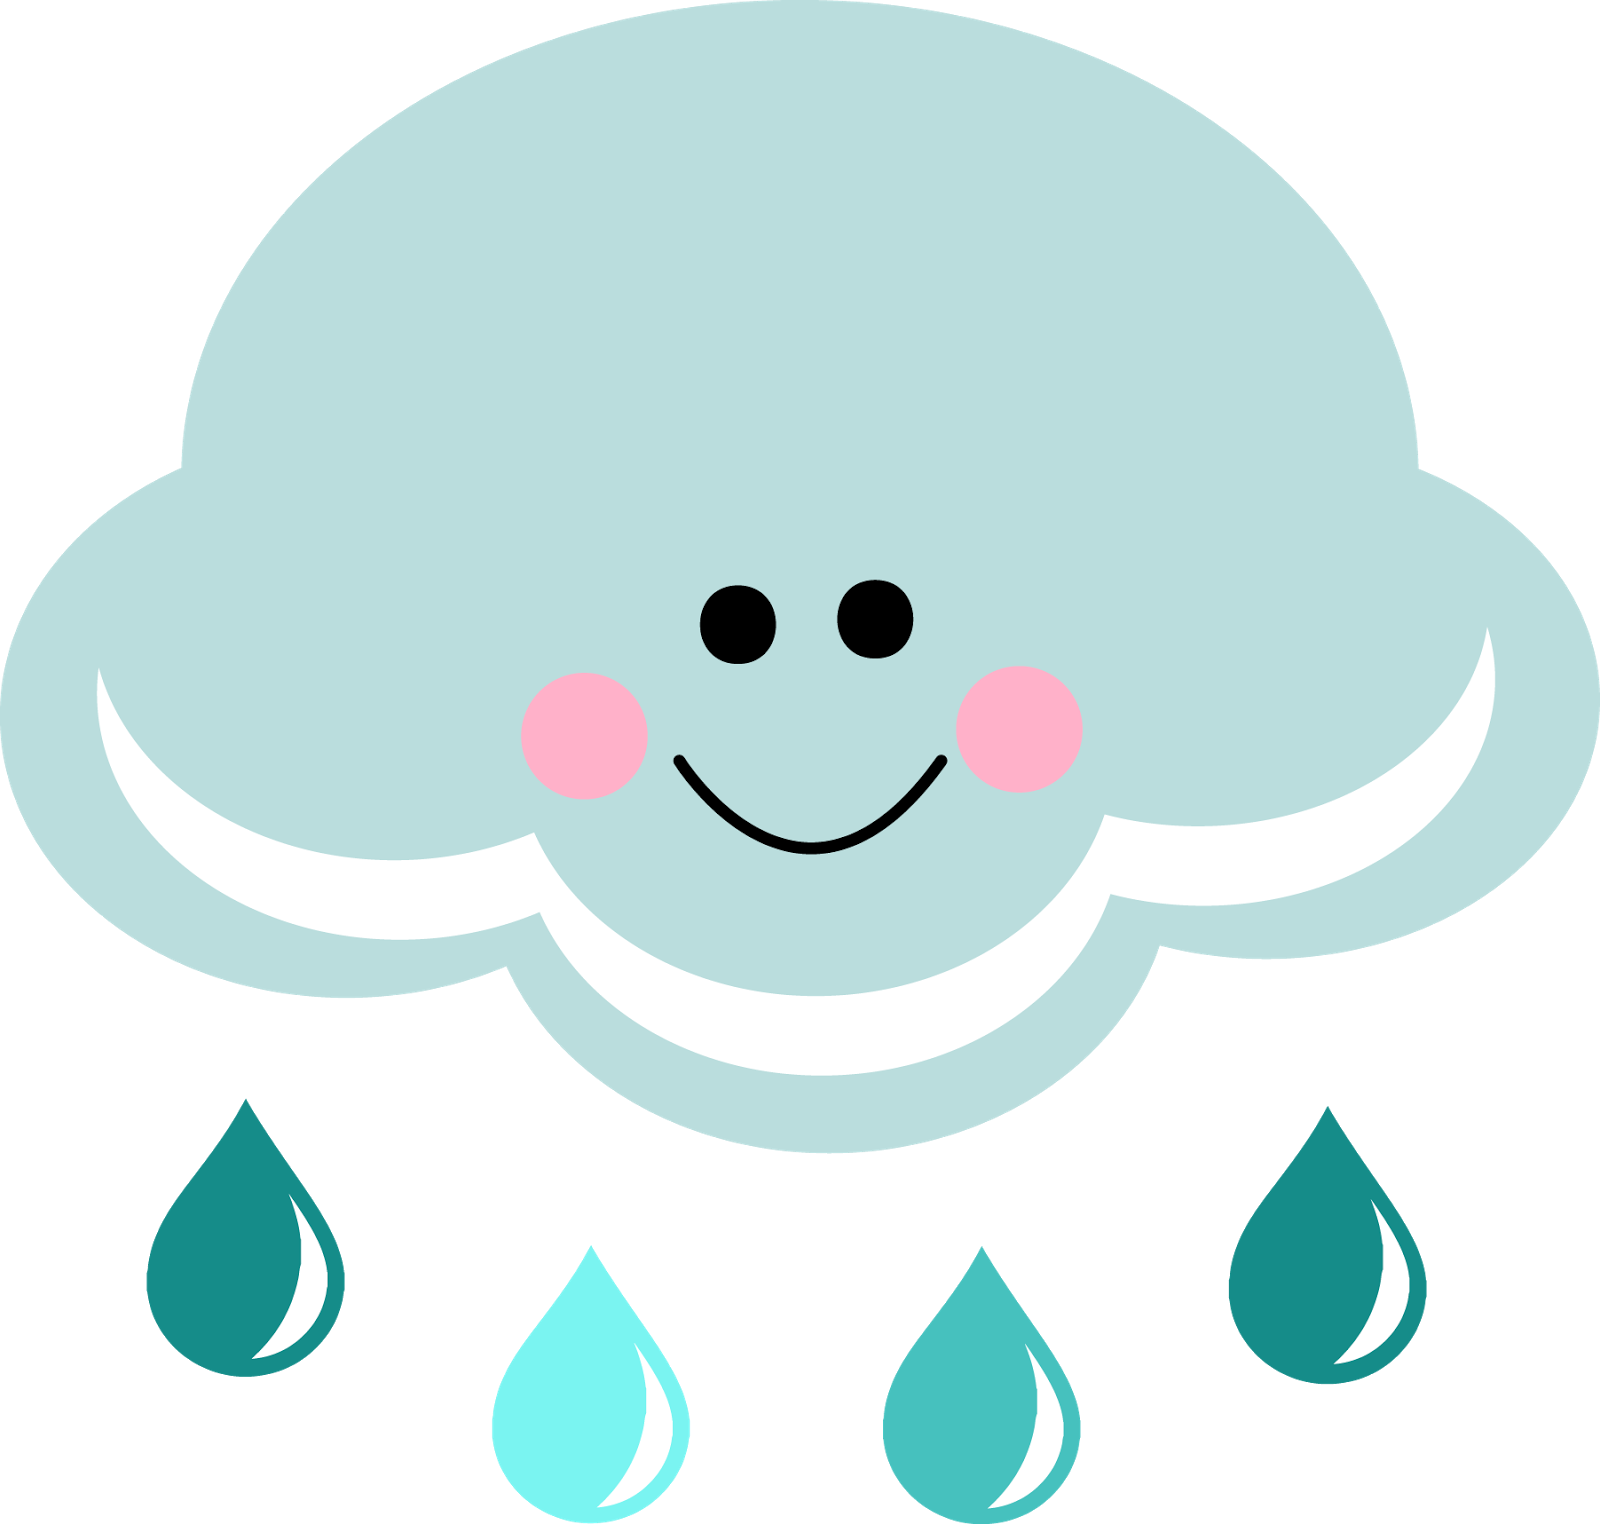 HAPPY RAIN Quotes Like Success